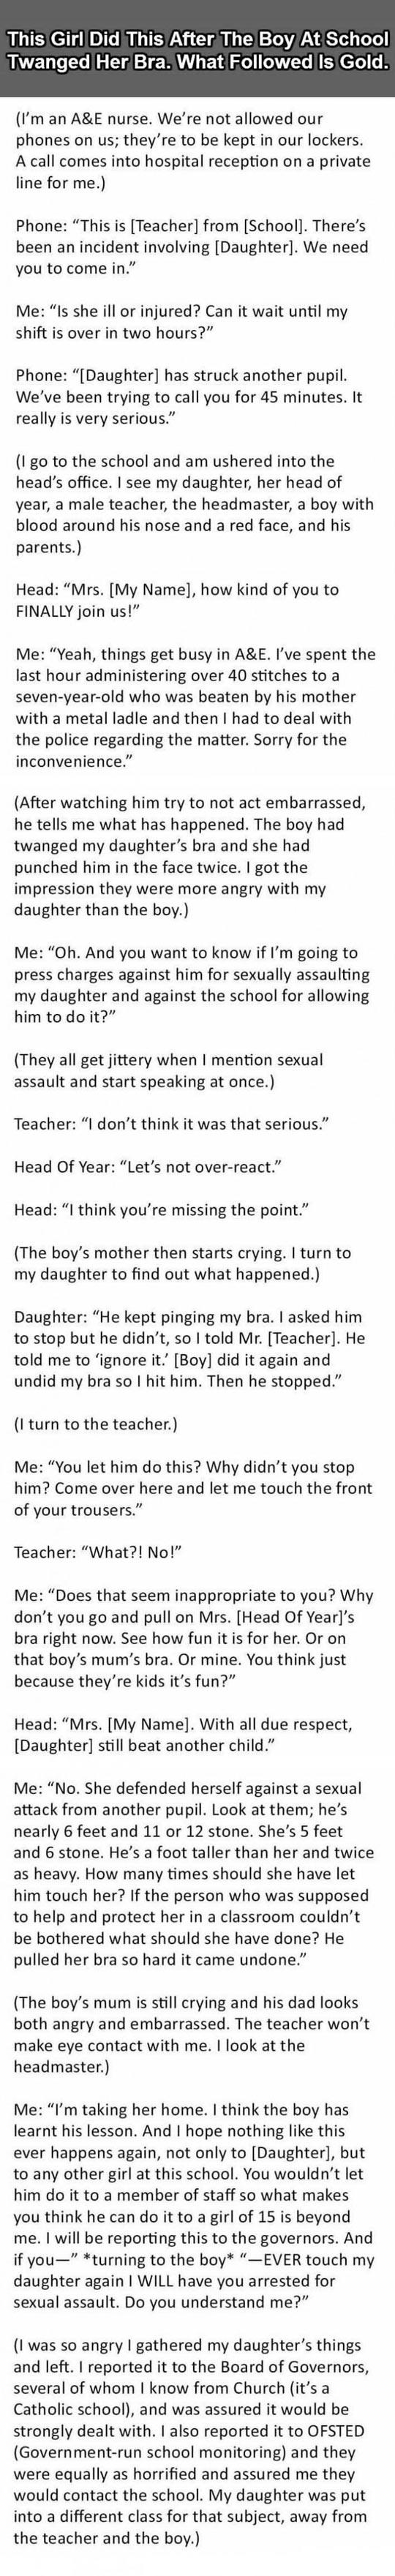 funny-story-girl-boy-school